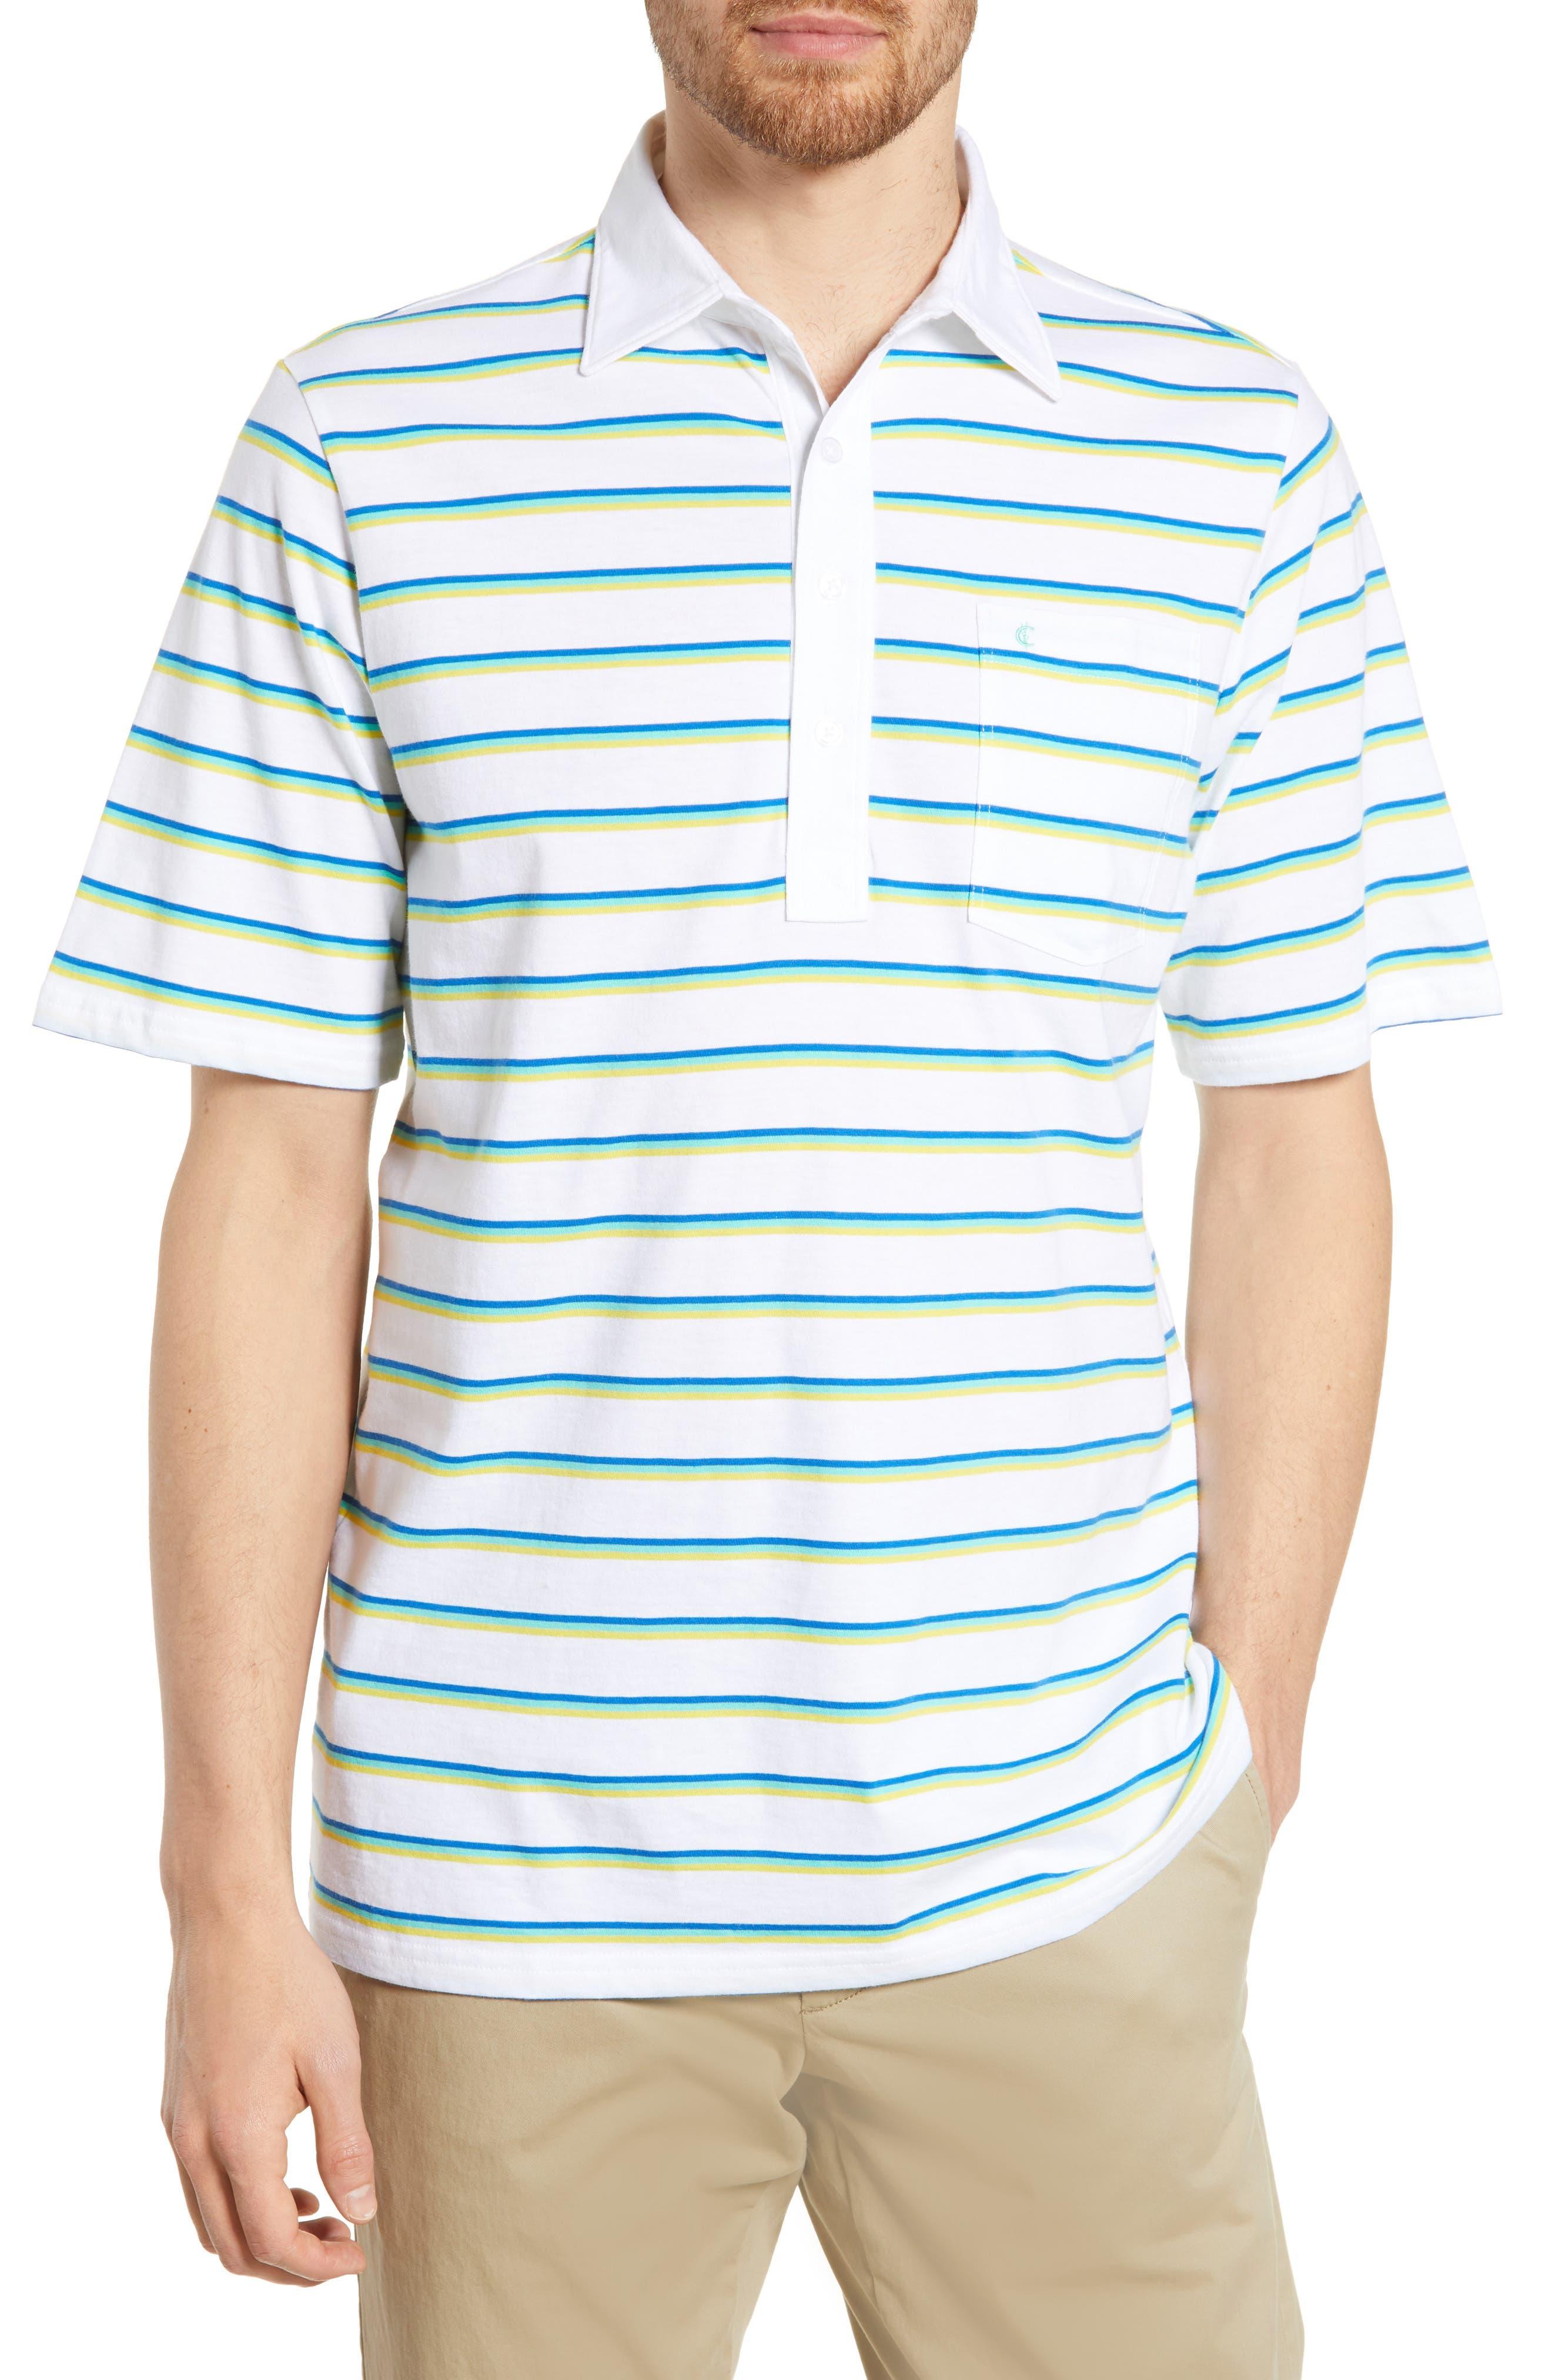 Criquet Regular Fit Players Stripe Jersey Polo, Blue